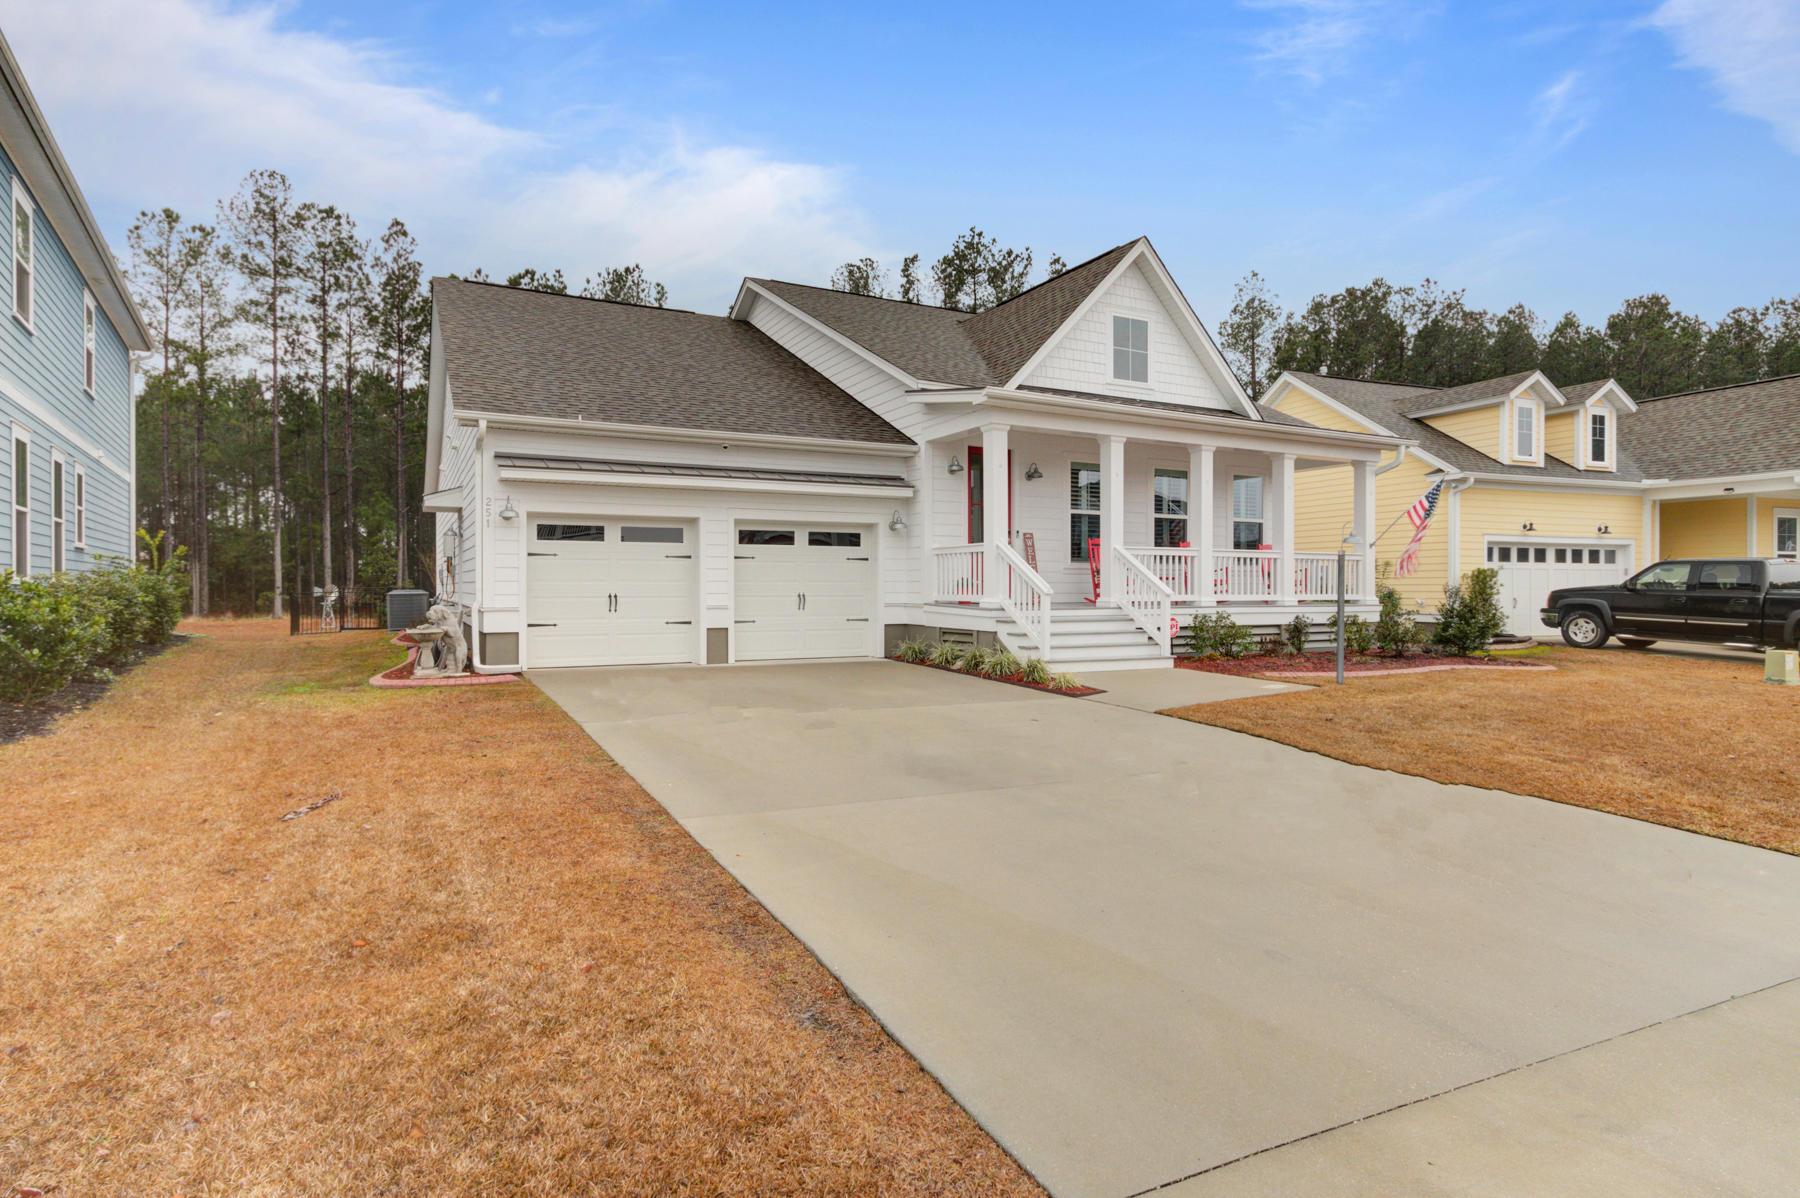 Cane Bay Plantation Homes For Sale - 251 Calm Water, Summerville, SC - 6